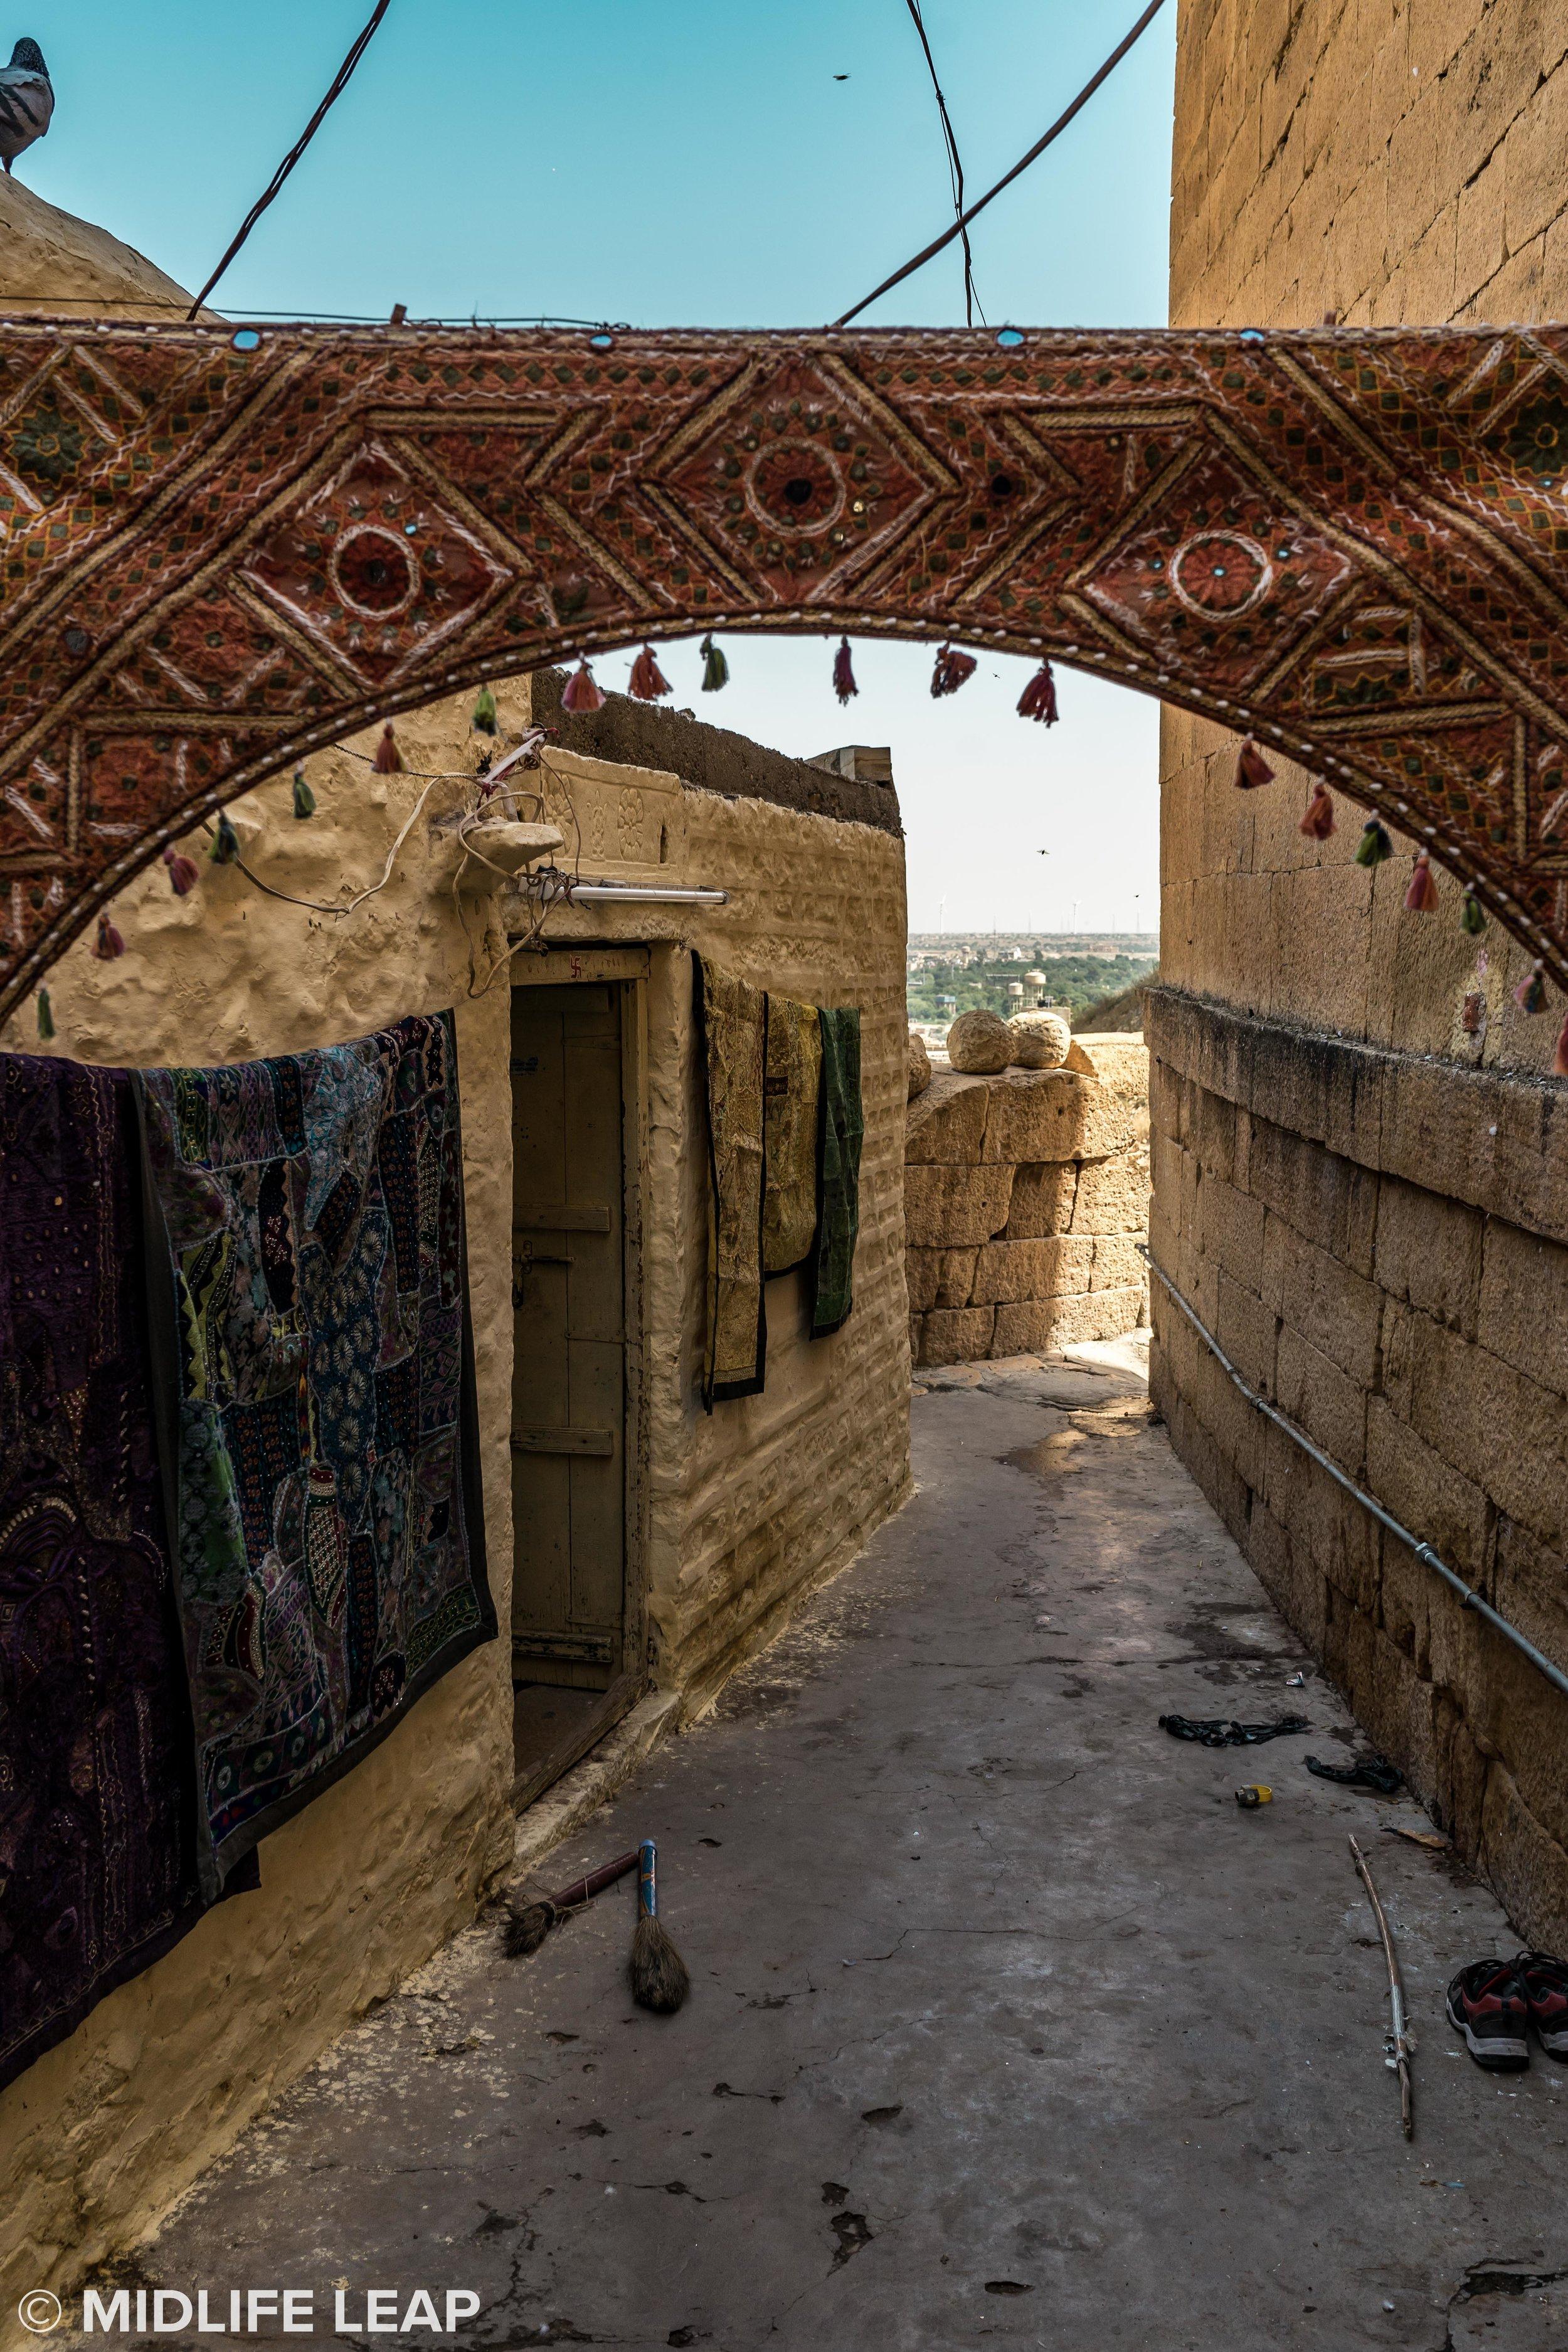 views-from-inside-jaisalmer-fort-rajasthan.jpg